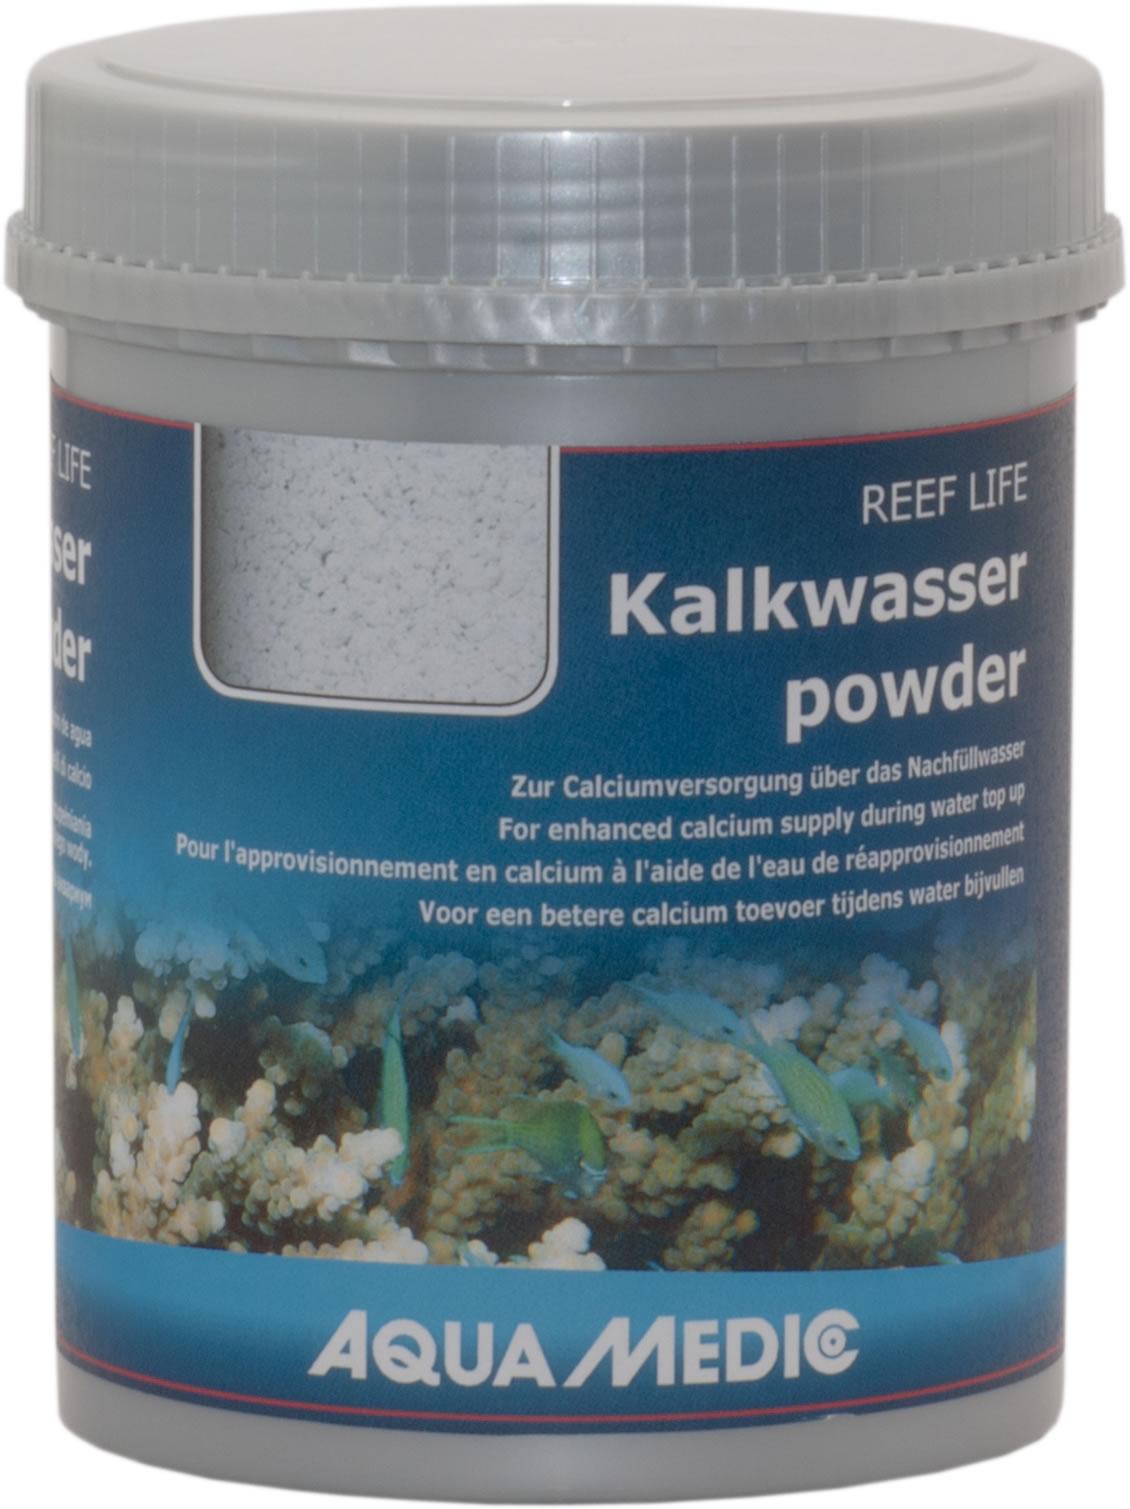 Aqua Medic REEF LIFE Kalkwasserpowder - 1000 ml